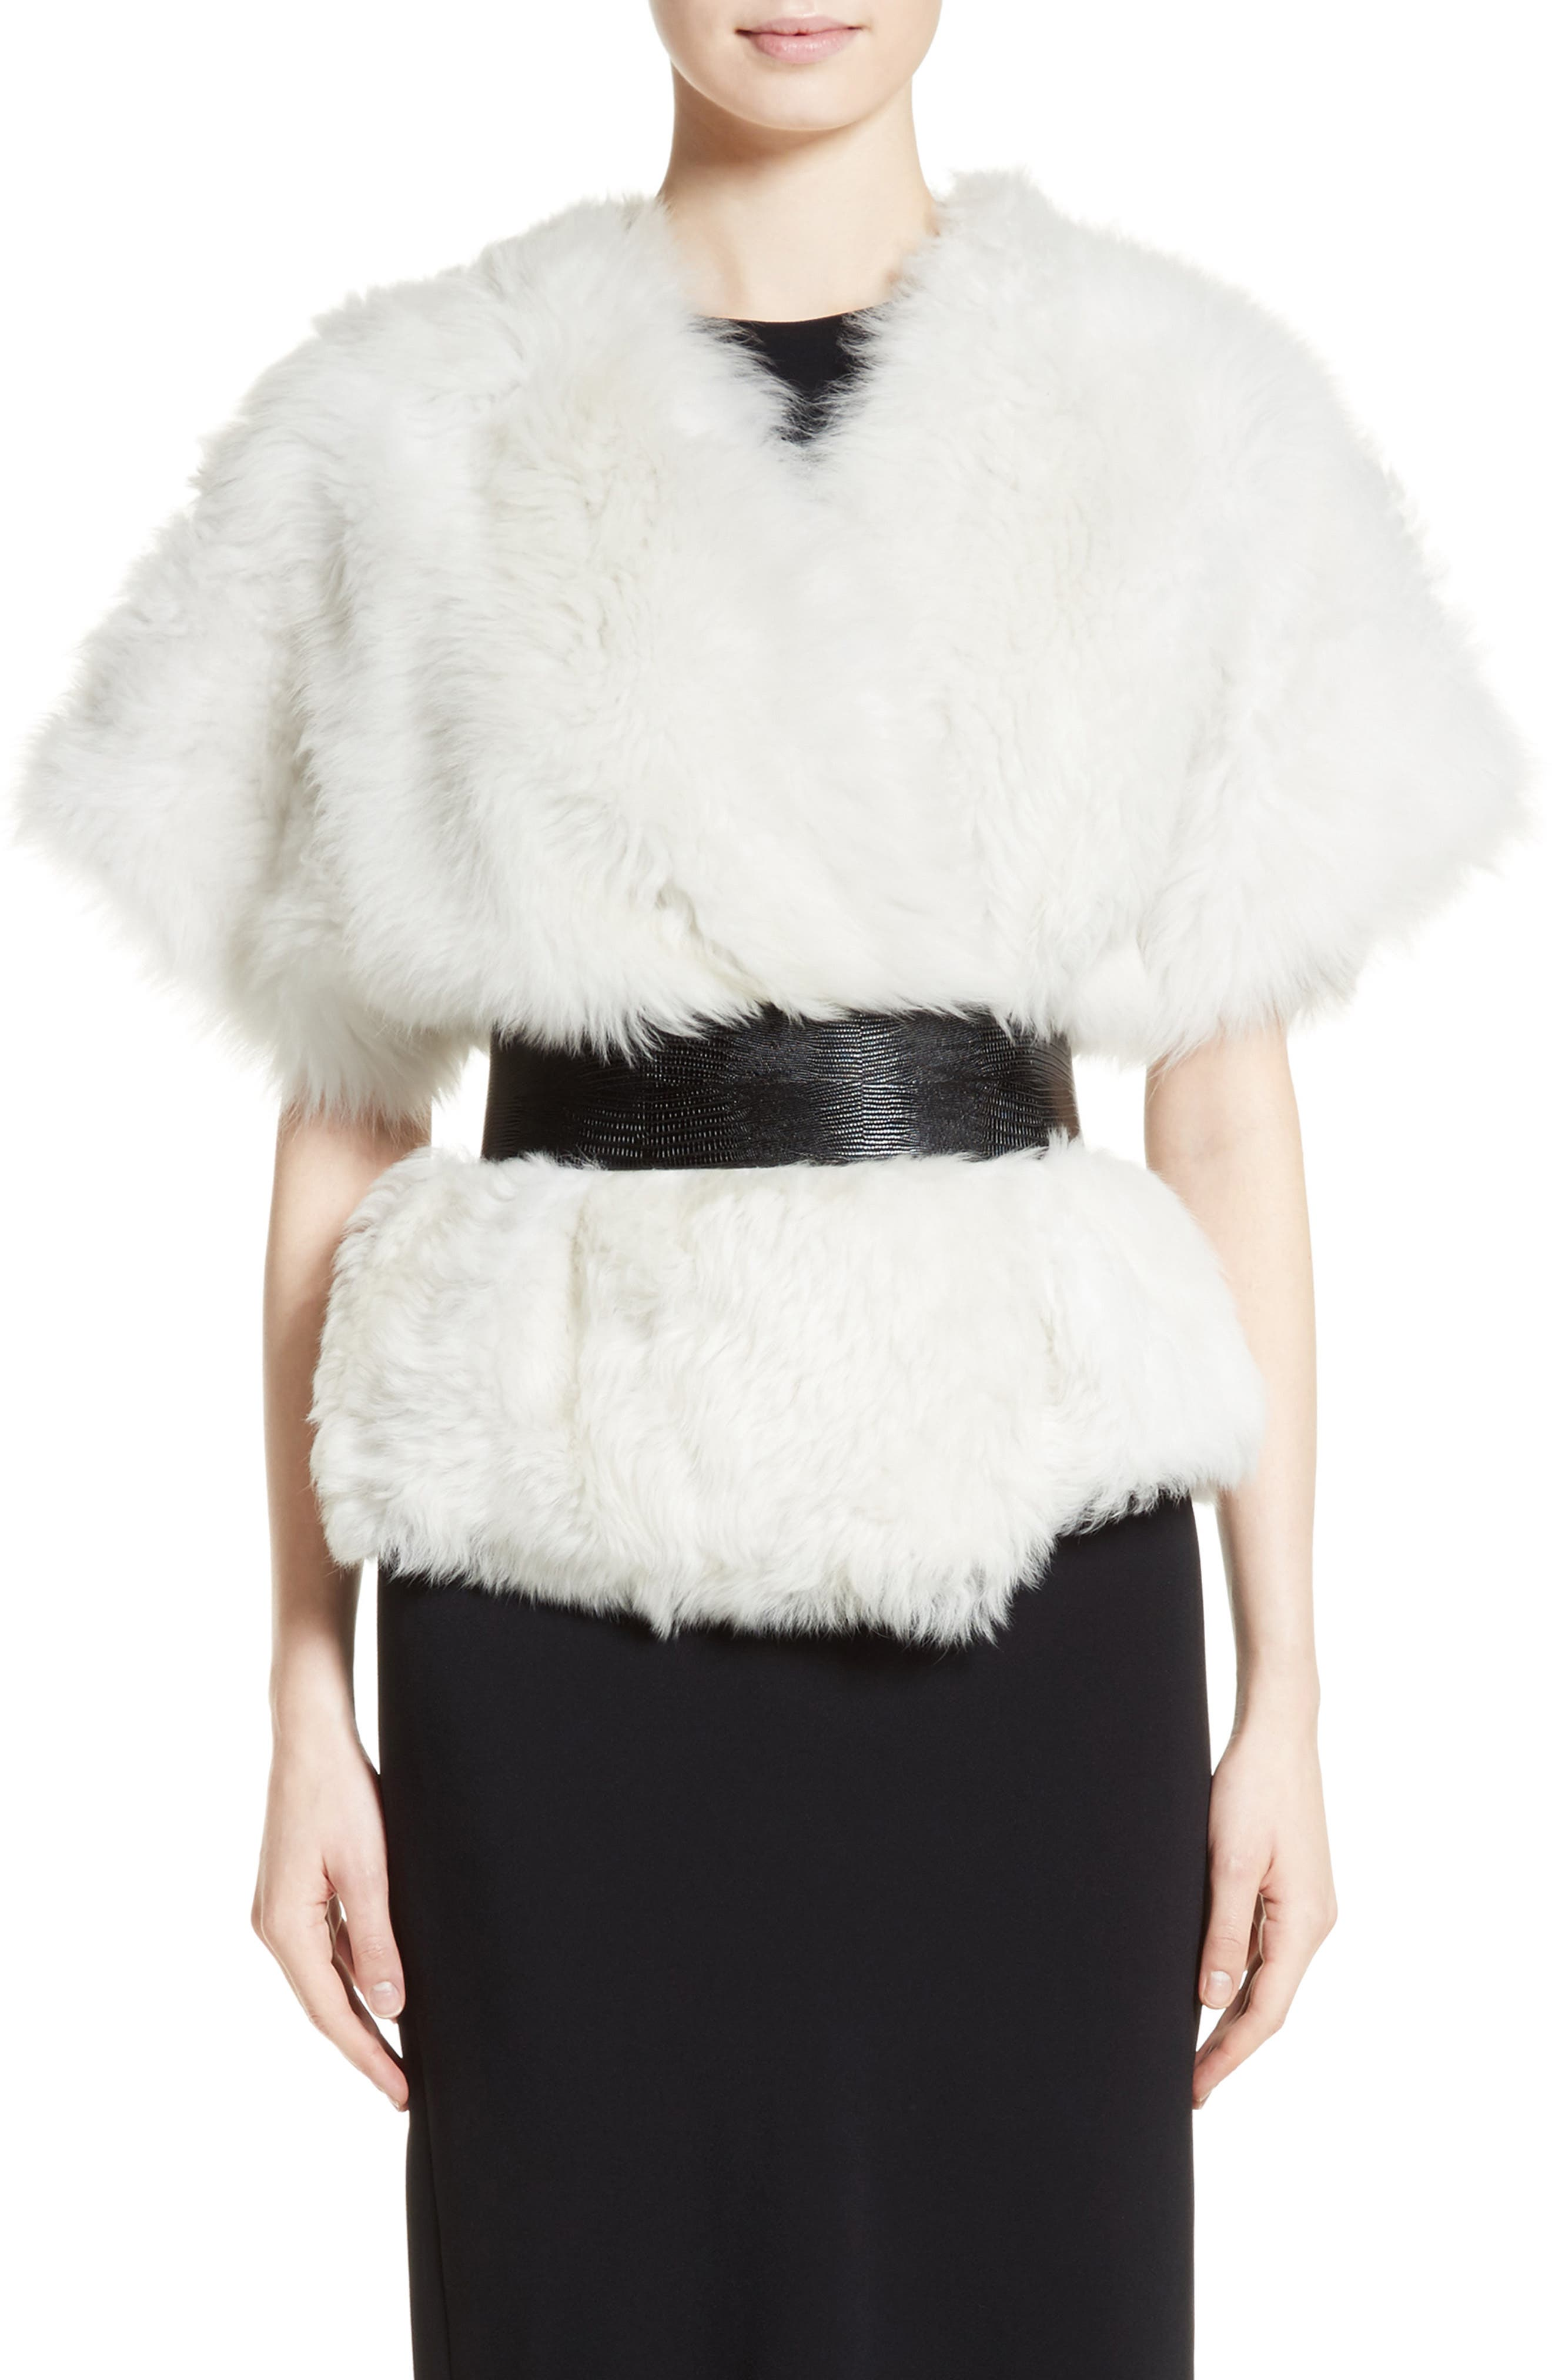 Alternate Image 1 Selected - Max Mara Fiorigi Genuine Lamb Fur Bolero